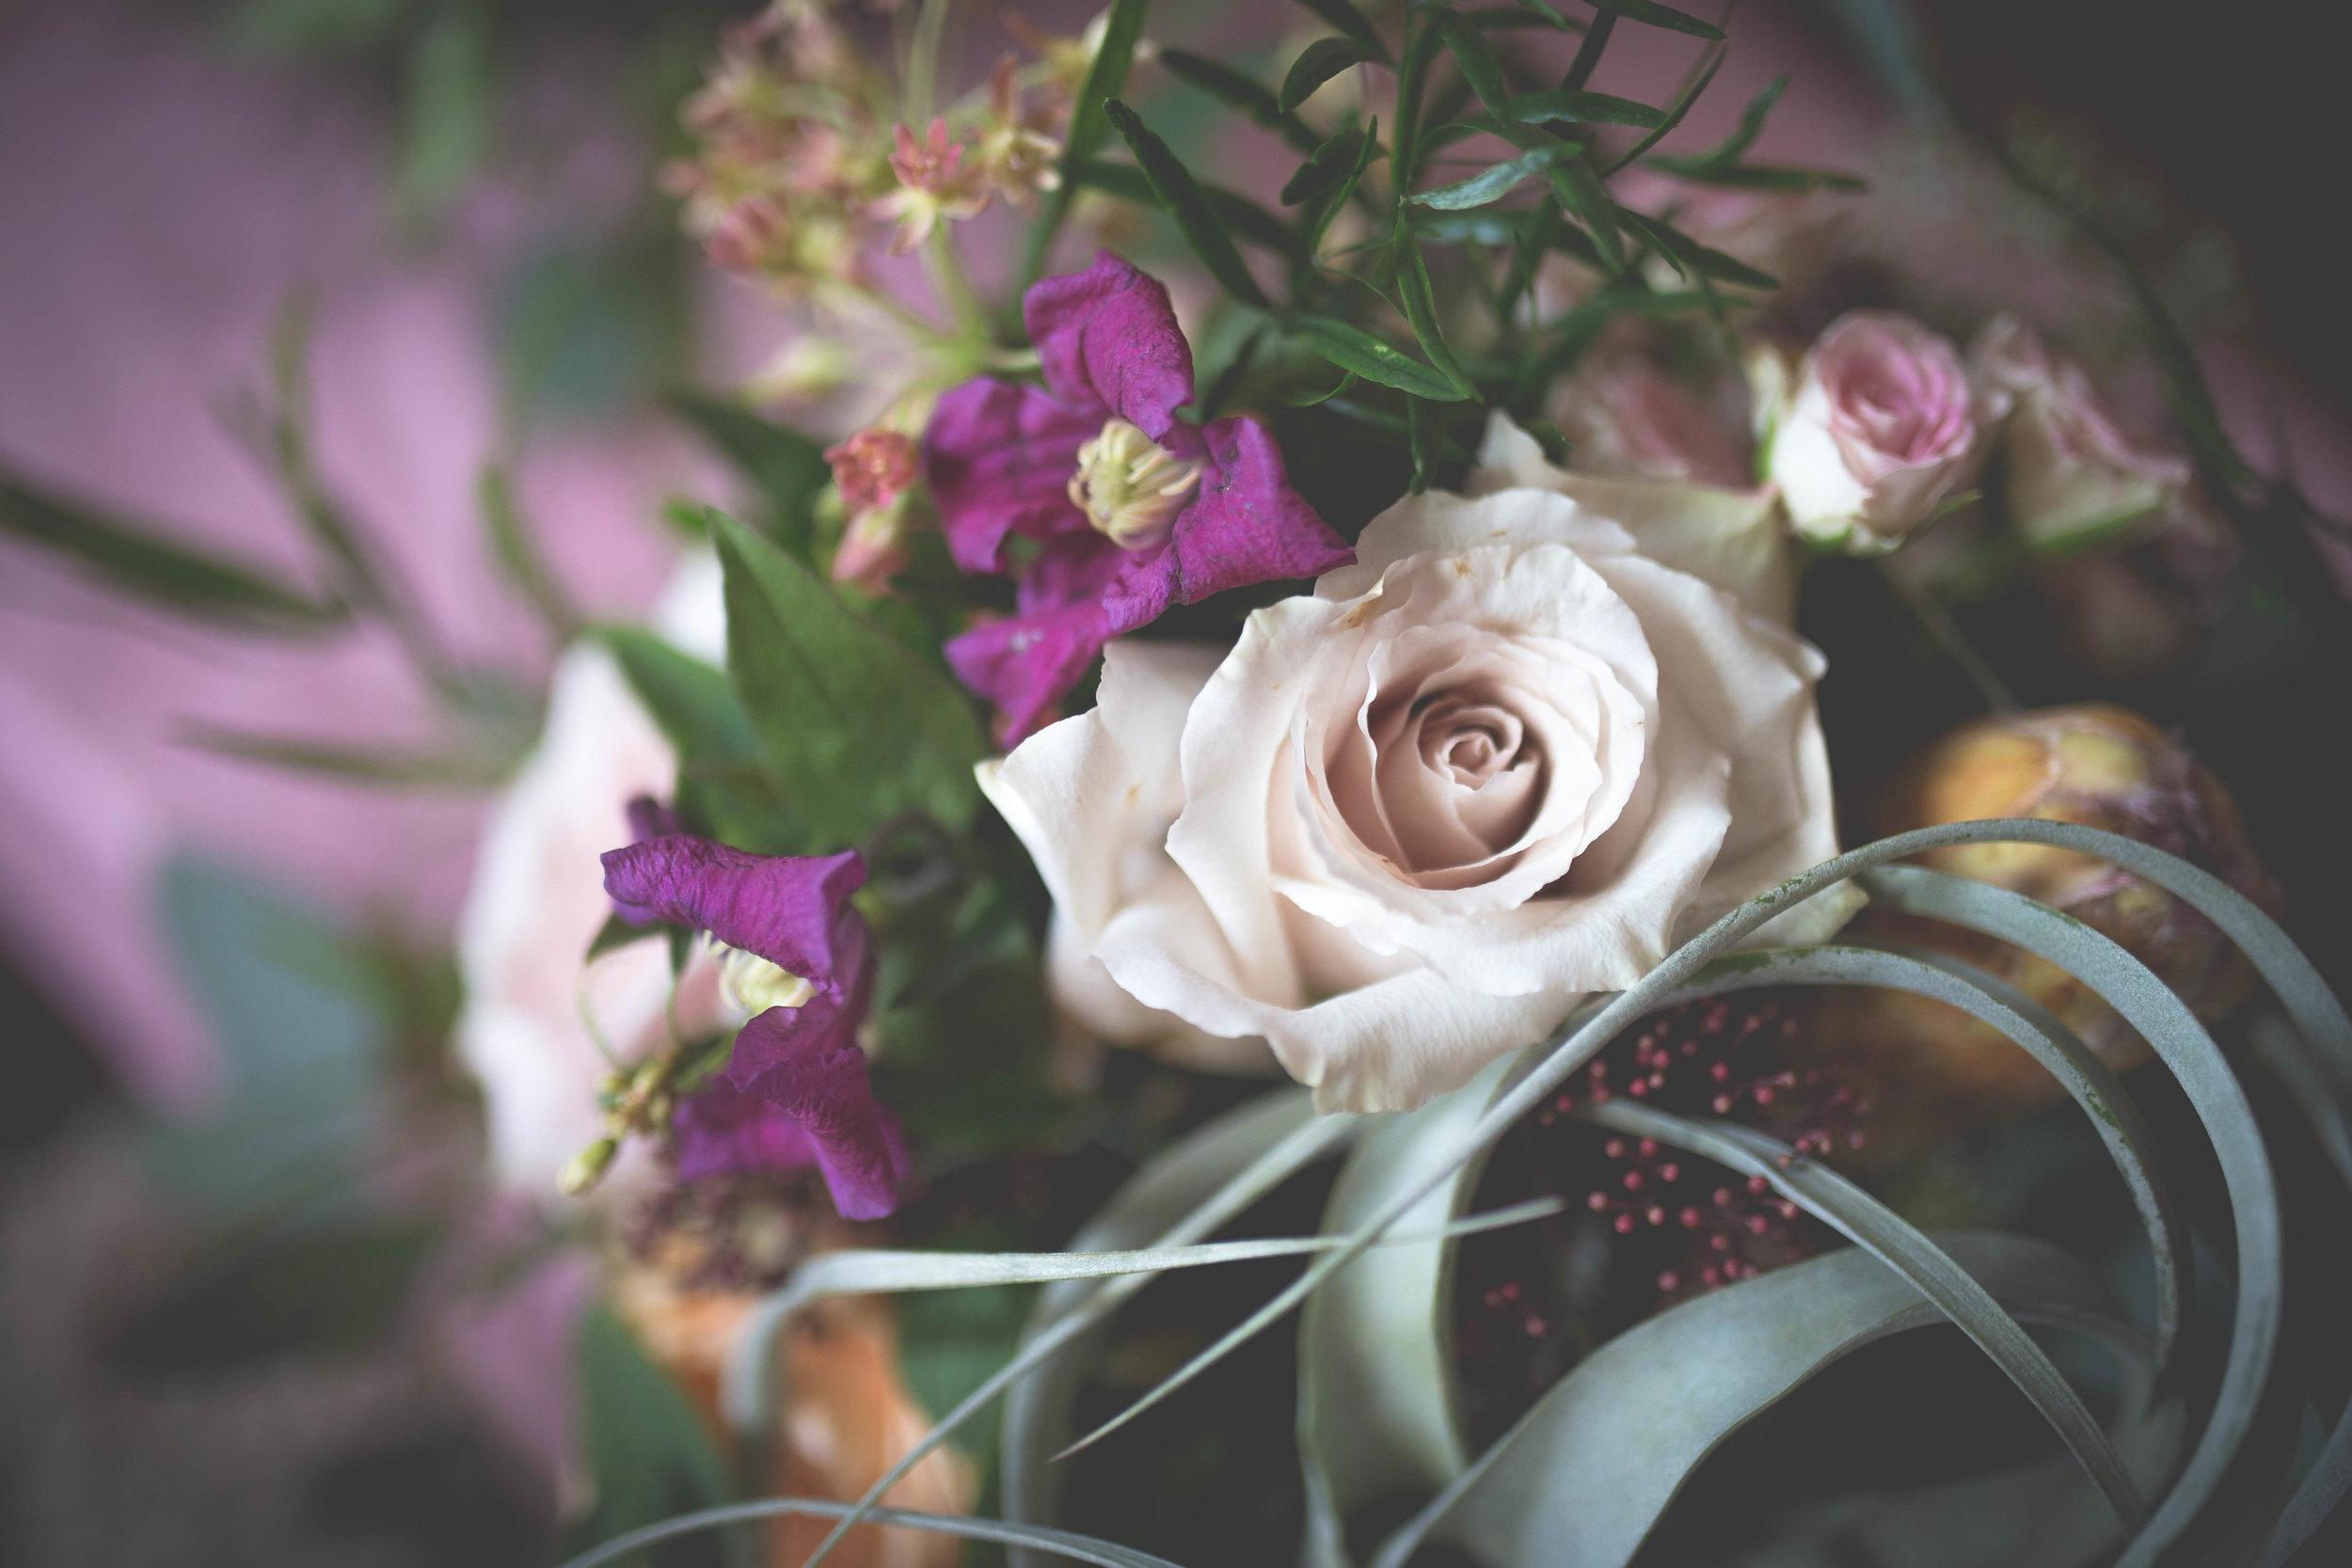 Northern Ireland Wedding Photographer | Brian McEwan Photography | Affordable Wedding Photography Throughout Antrim Down Armagh Tyrone Londonderry Derry Down Fermanagh -60.jpg